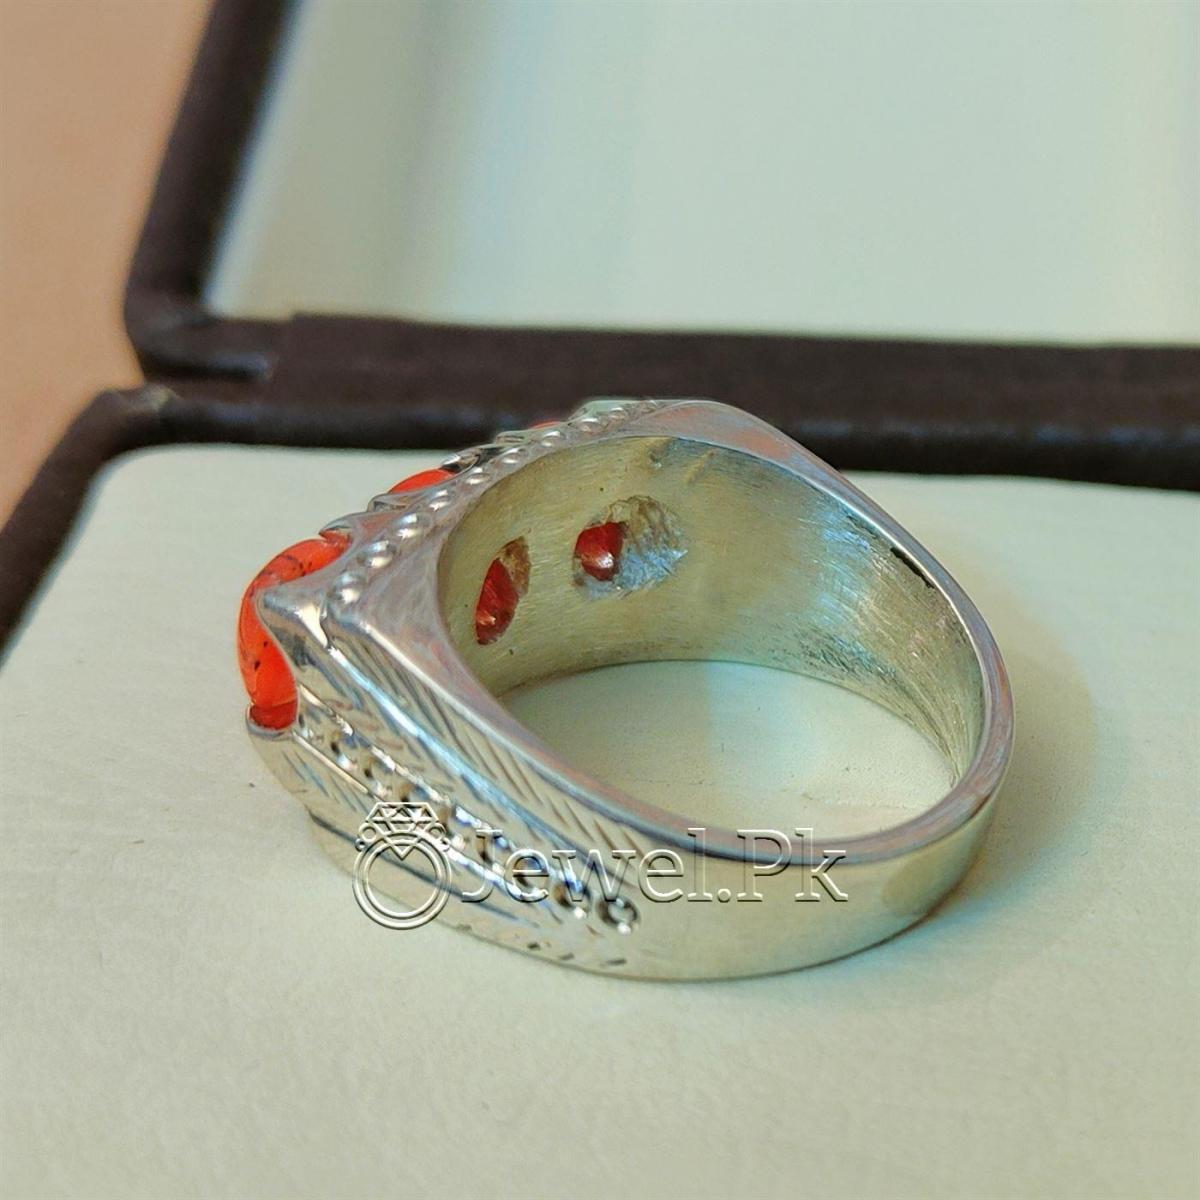 Natural Coral Marjan Ring Handmade 925 Silver Marjan stone 4 natural gemstones pakistan + 925 silver jewelry online